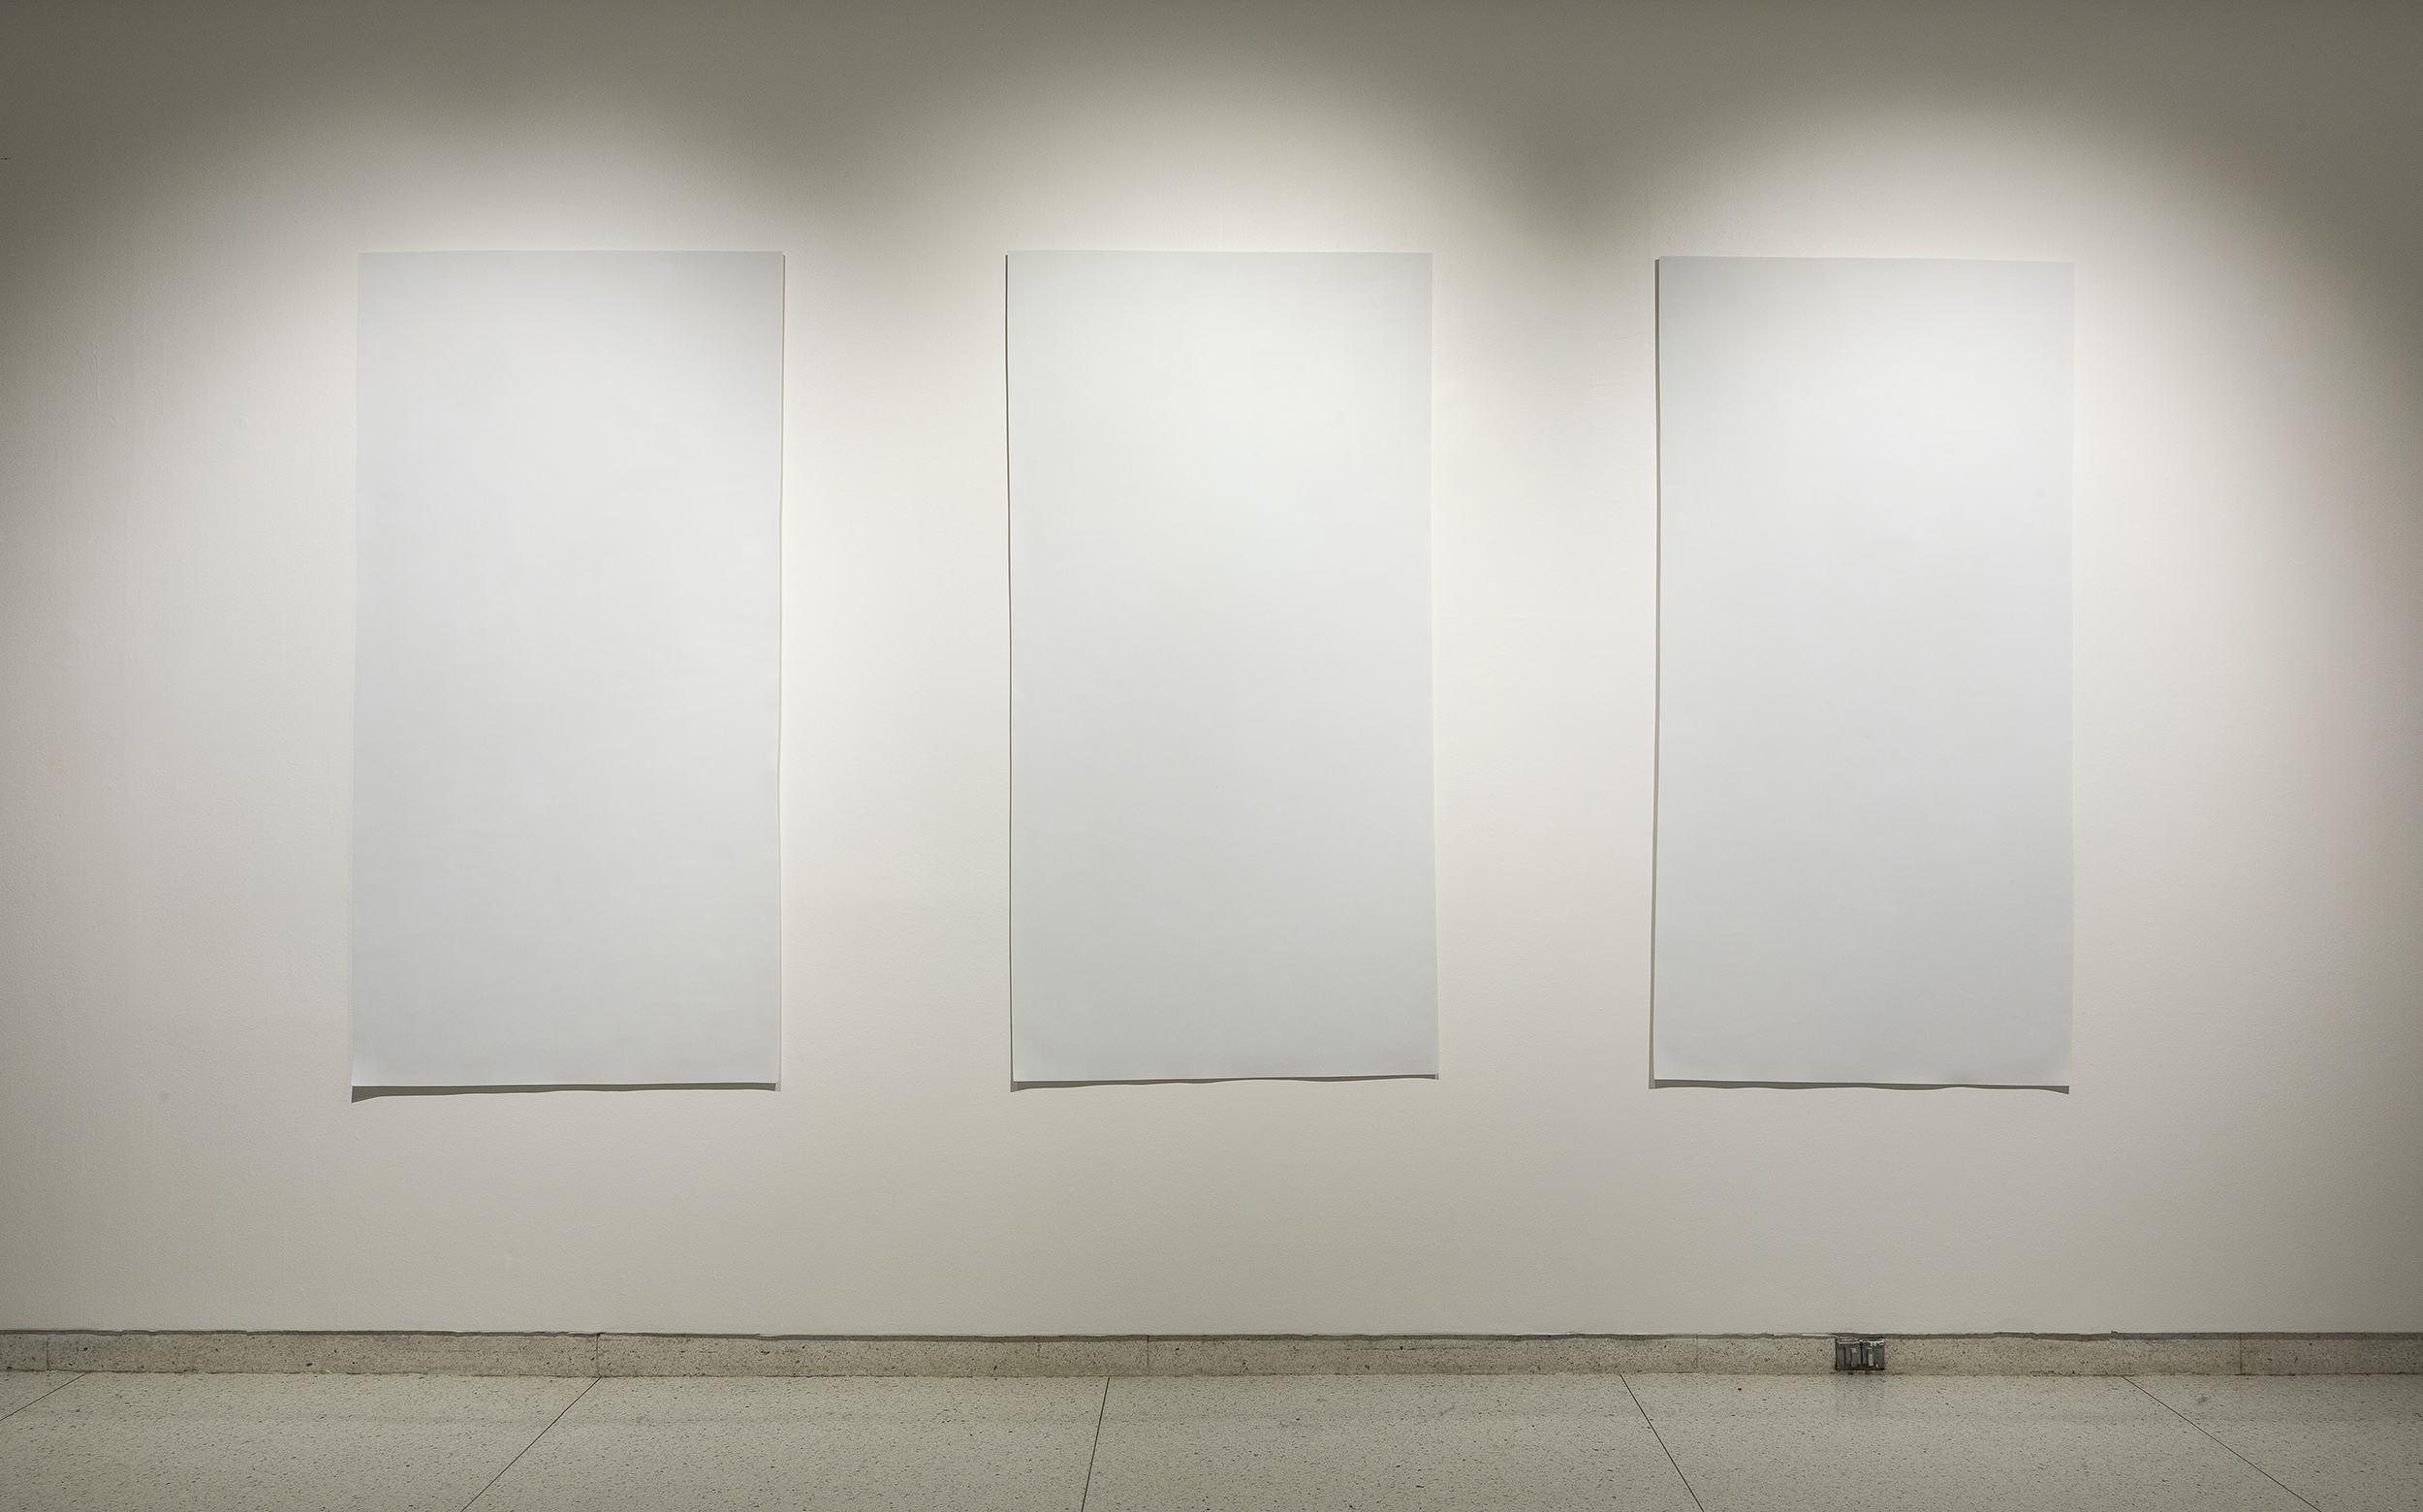 Liu Jianhua, Blank Paper, 2009–12